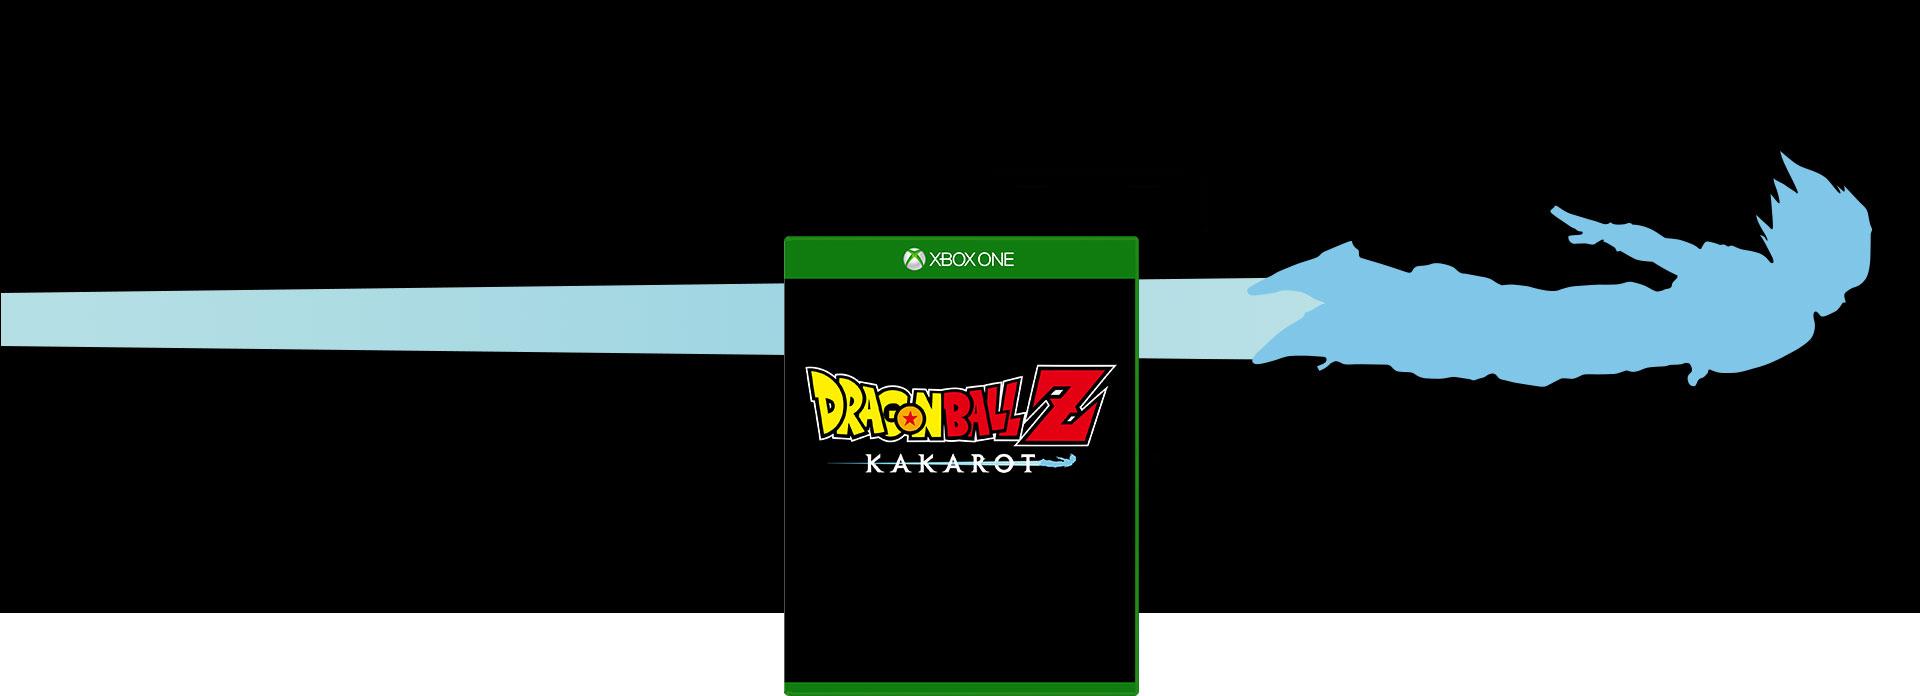 Dragon Ball Z: Kakarot boxshot with a blue outline of Goku flying horizontally